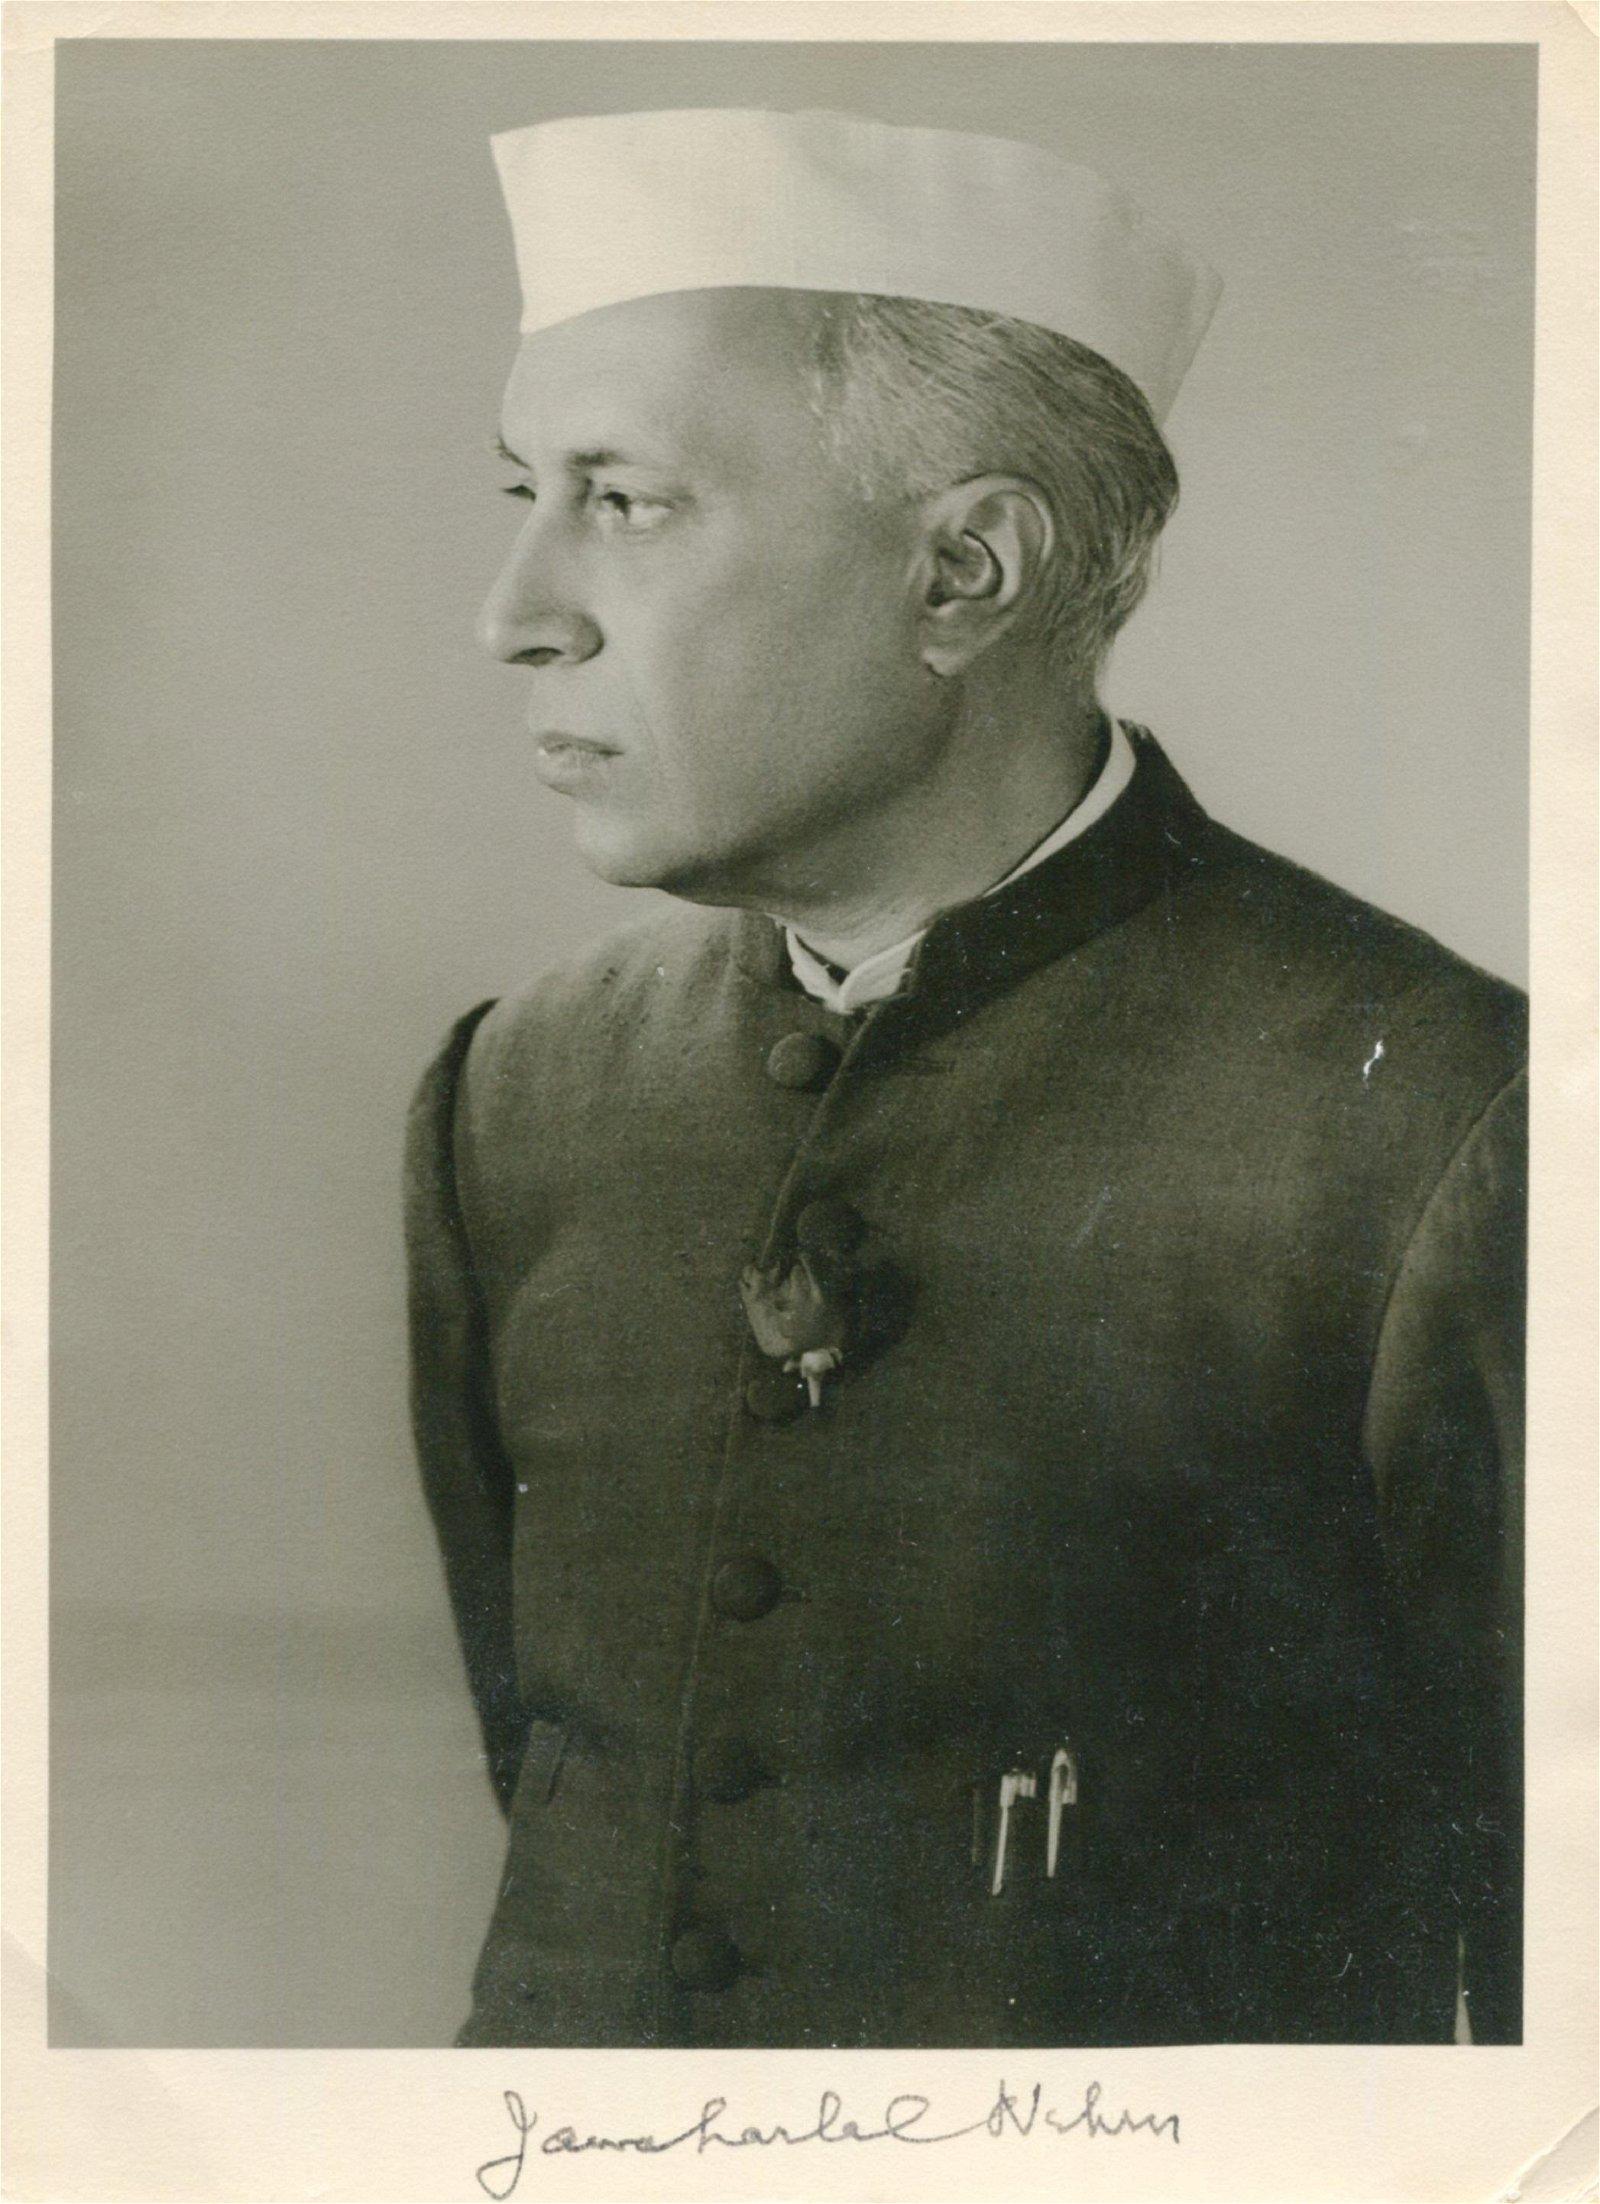 NEHRU JAWAHARLAL: (1889-1964)